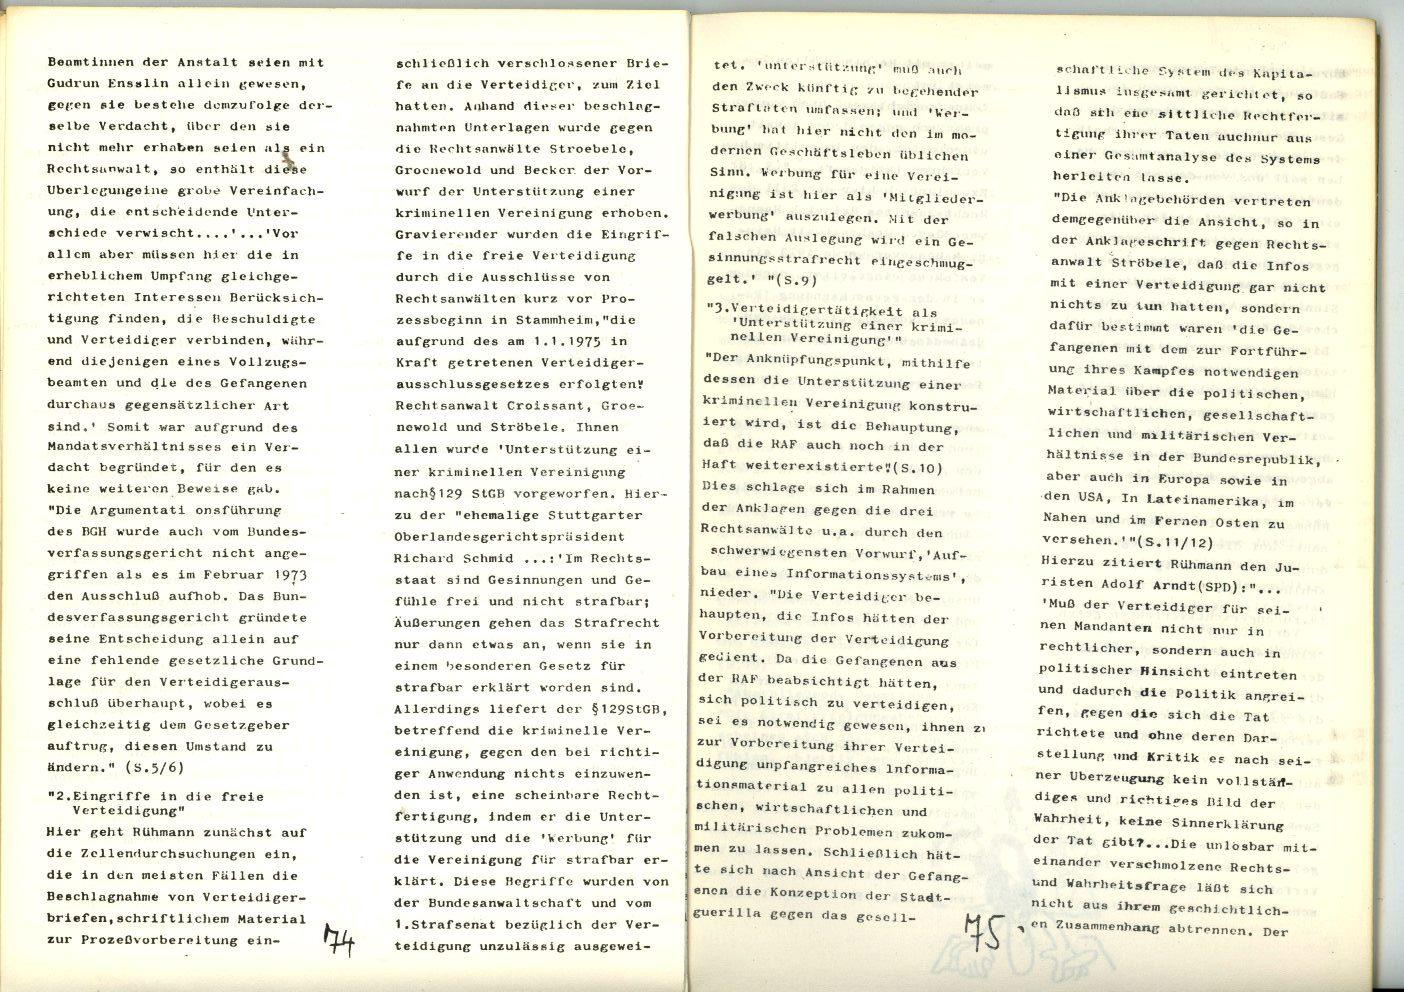 Marburg_Russell_Initiative_1978_39